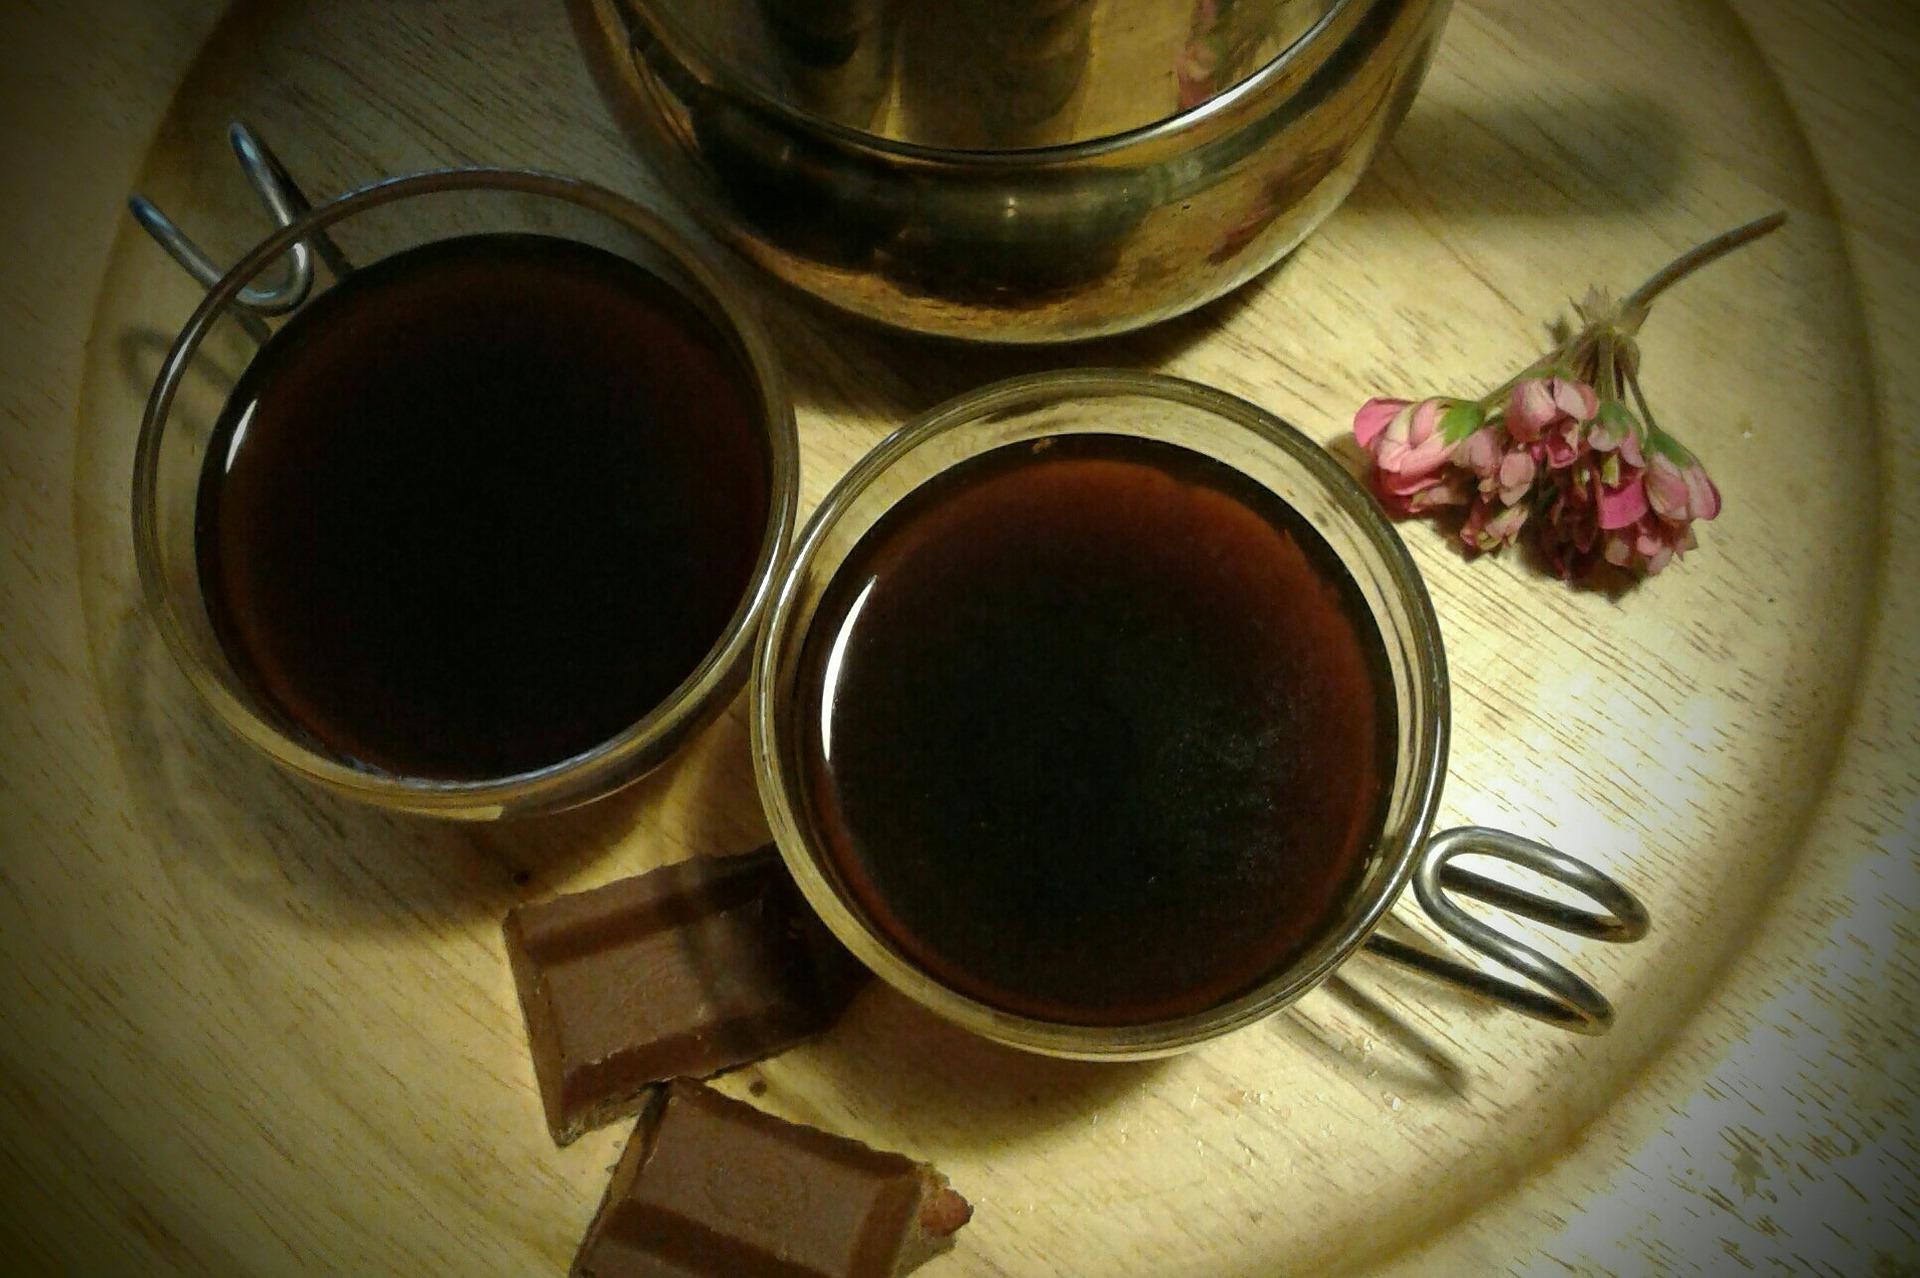 coffe-946551_1920